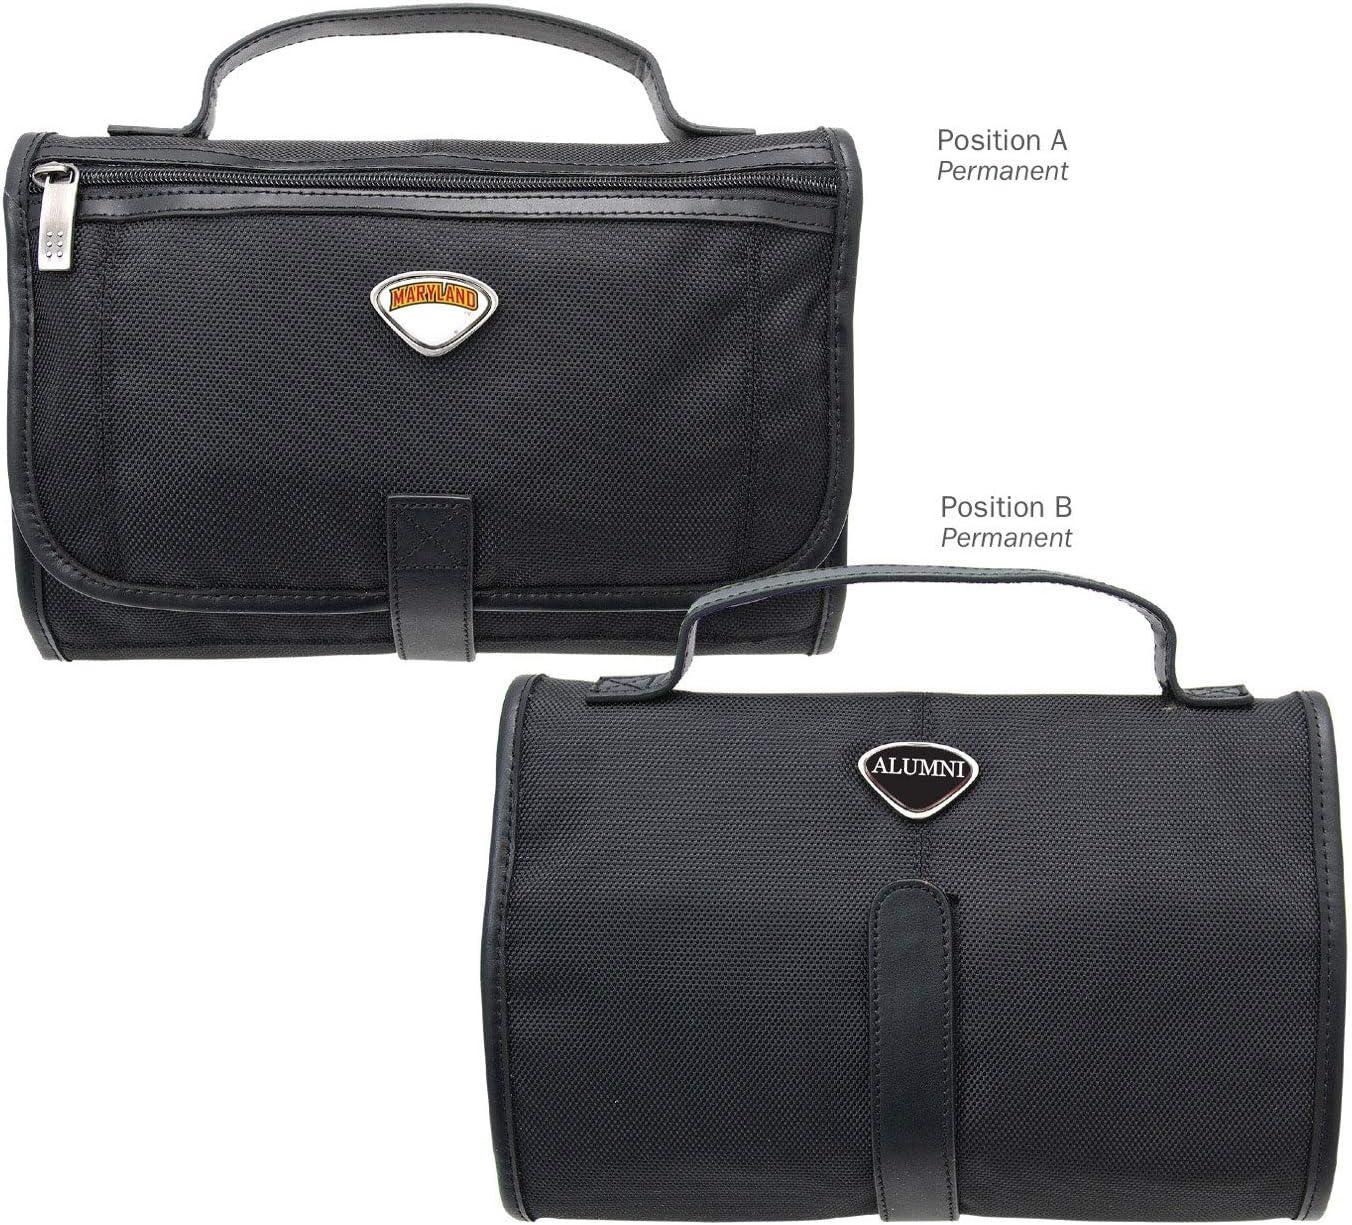 One Size Black AdSpec NCAA Maryland Terrapins Collegiate Toiletry BagCollegiate Toiletry Bag